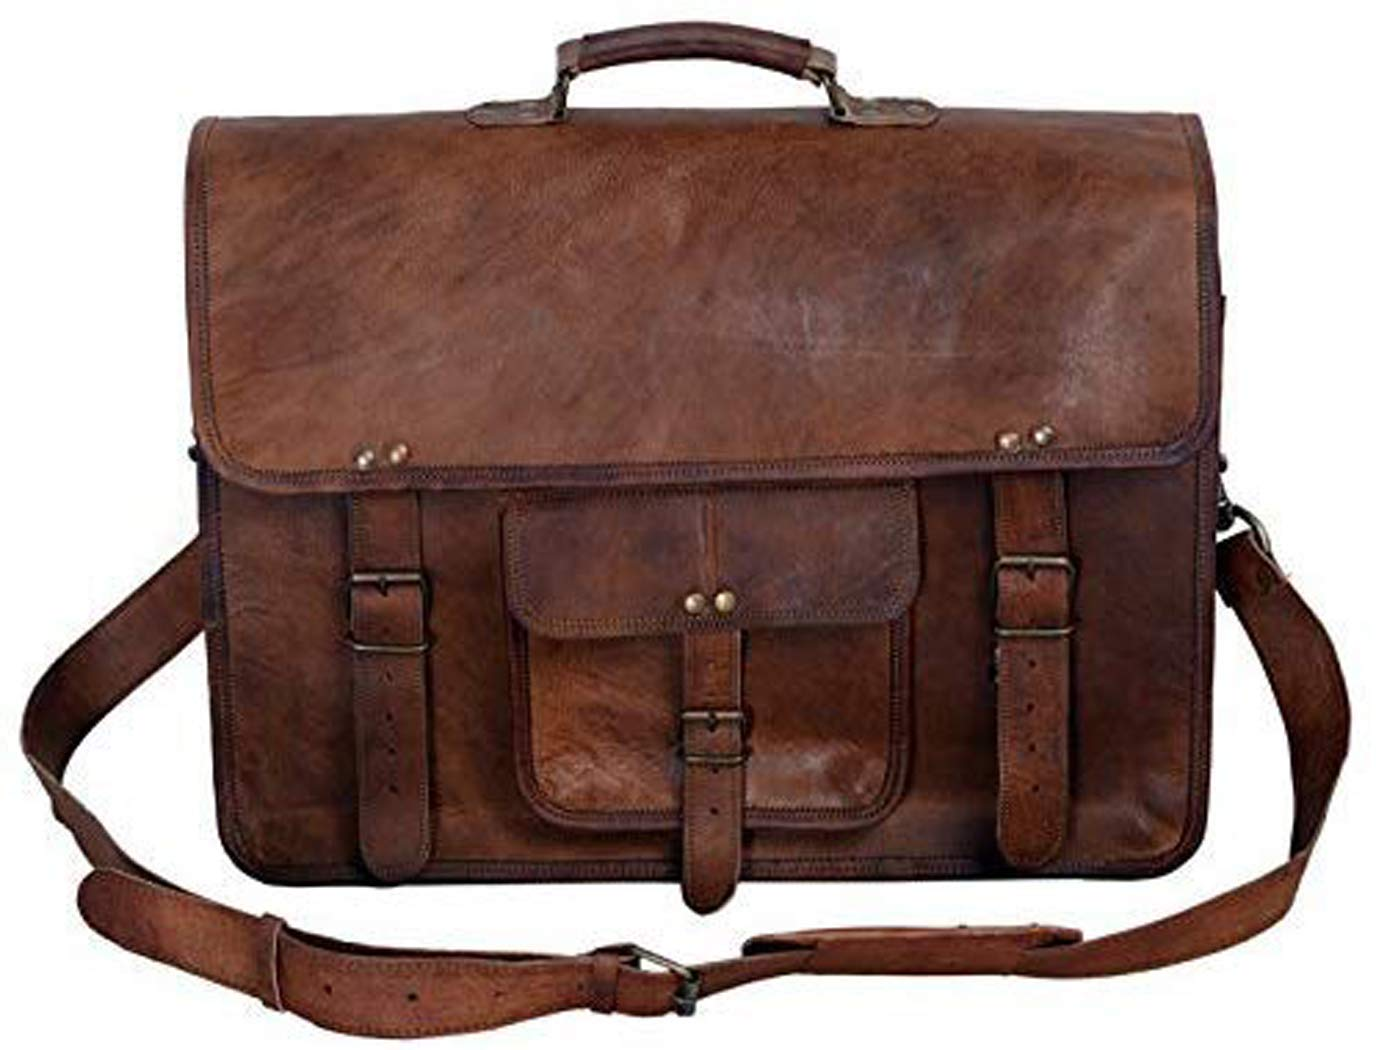 KPL 18 Inch Vintage Men's Brown Handmade Leather Briefcase Best Laptop Messenger Bag Satchel (16 Inch) by Komal''s Passion leather